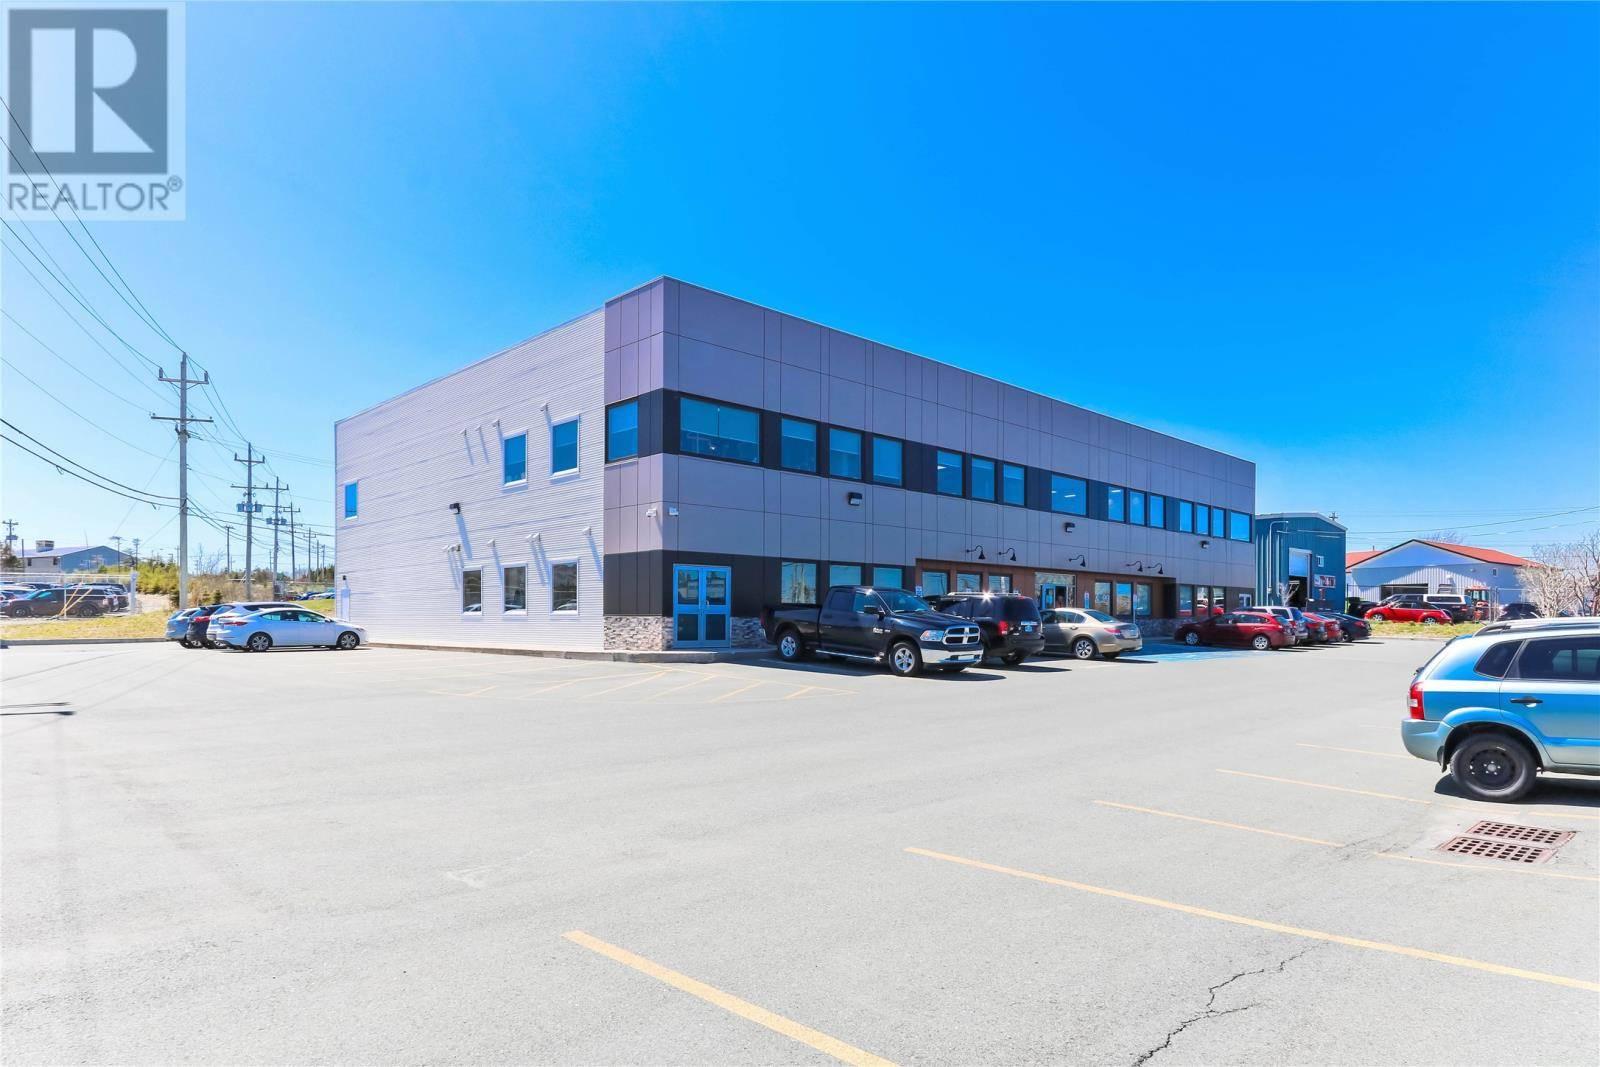 Residential property for sale at 14 International Pl Unit 202 St. John's Newfoundland - MLS: 1203217